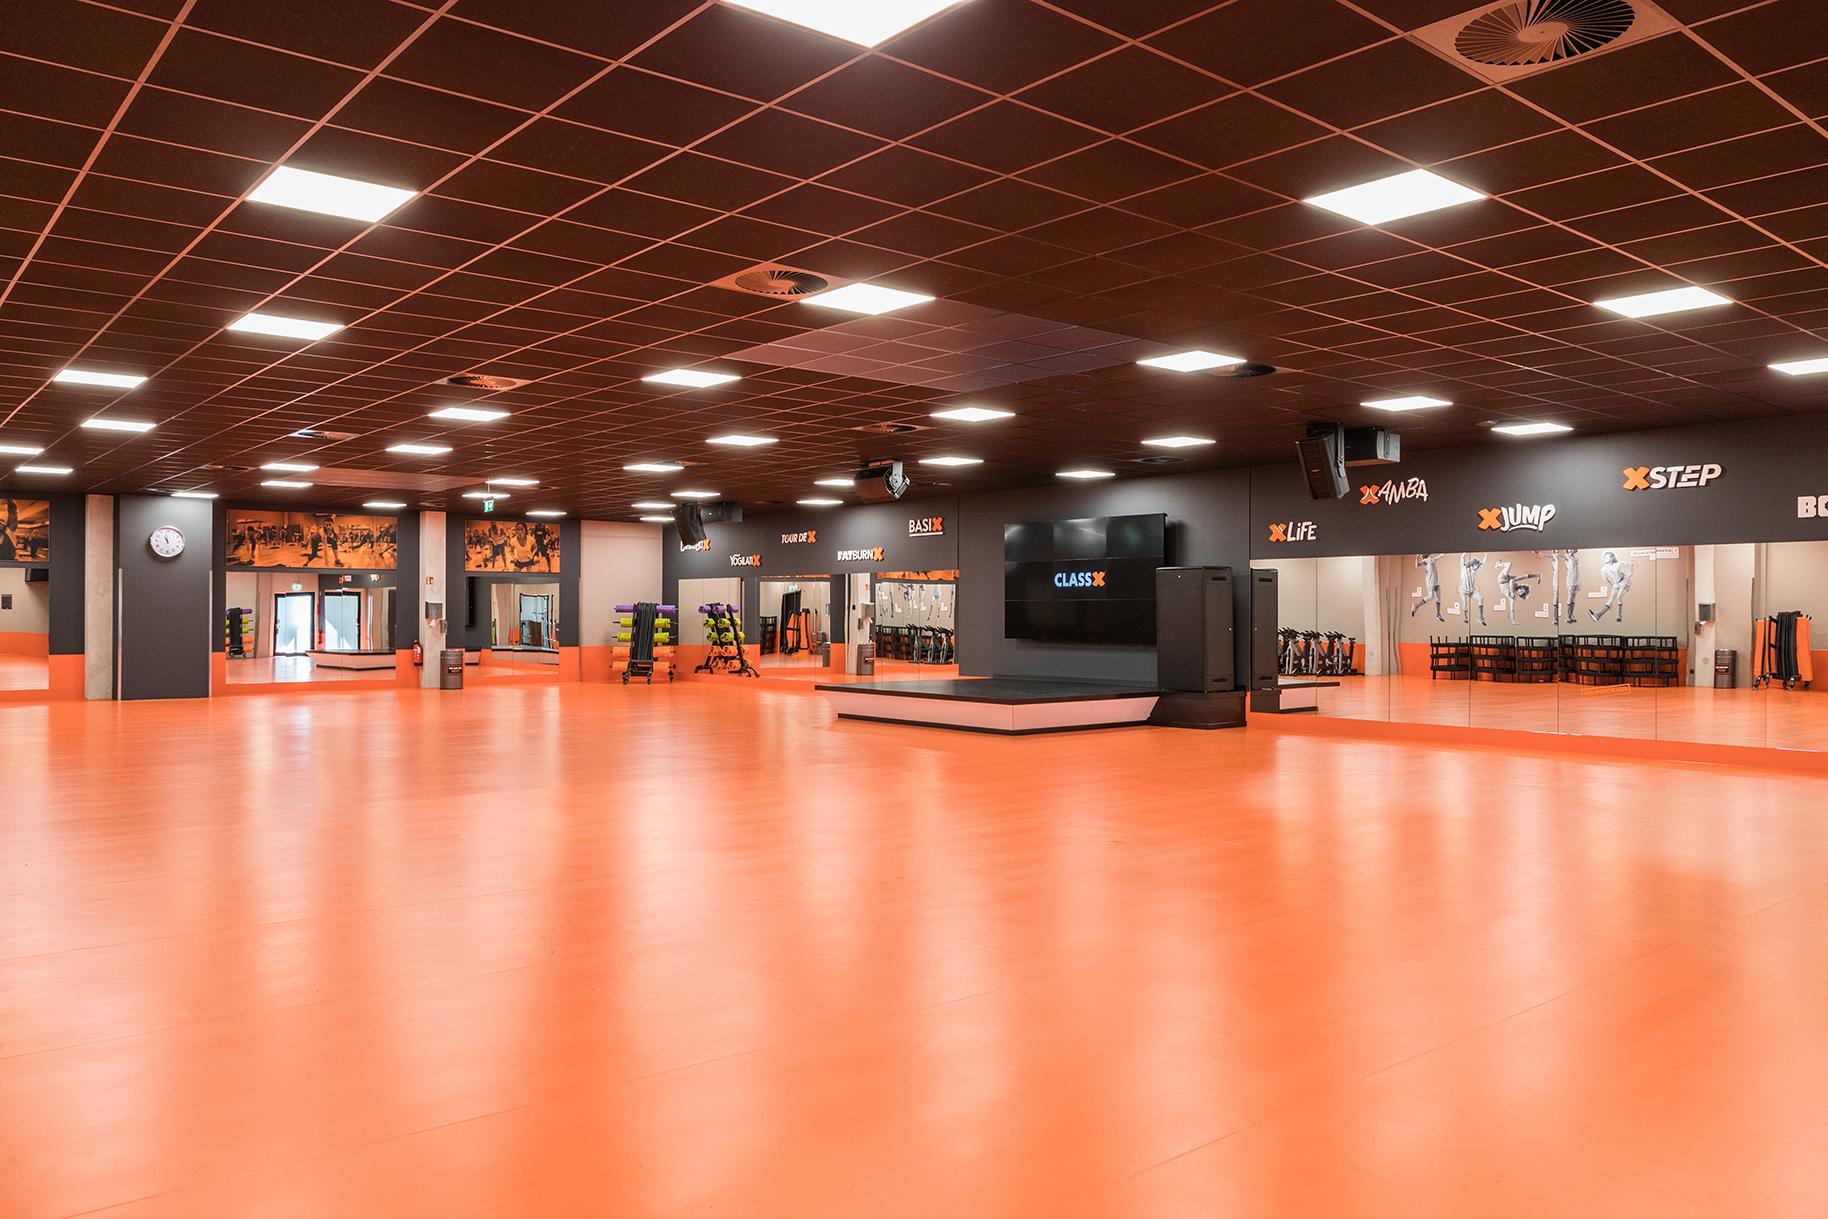 Fitnessstudiokette Fitx Kommt Nach Dresden Ins Wtc World Trade